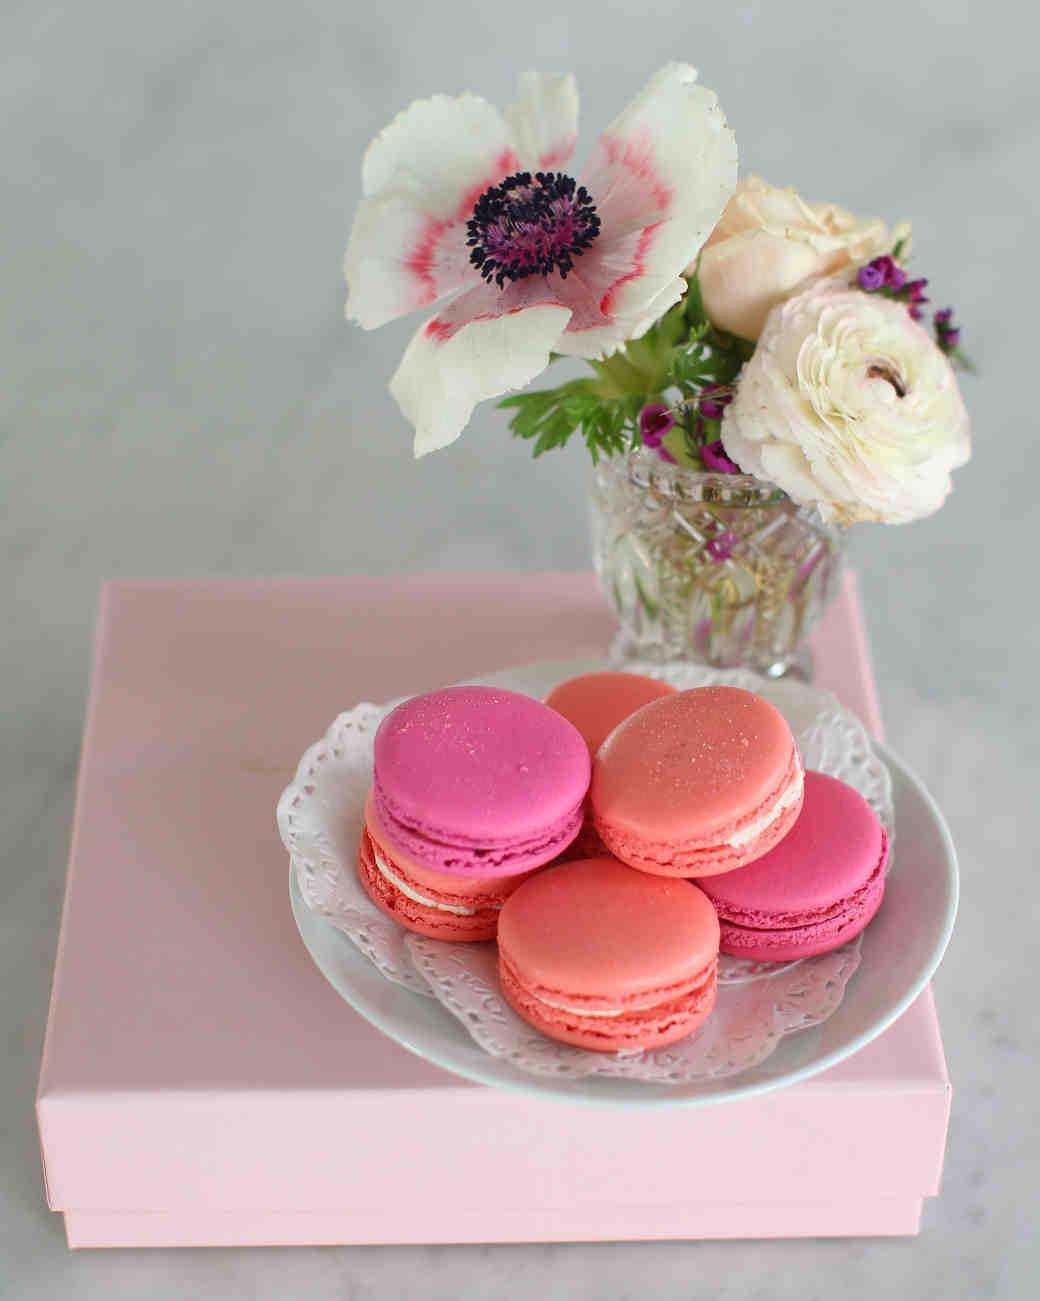 geri-hirsch-bridal-shower-tea-party-macarons-close-0315.jpg